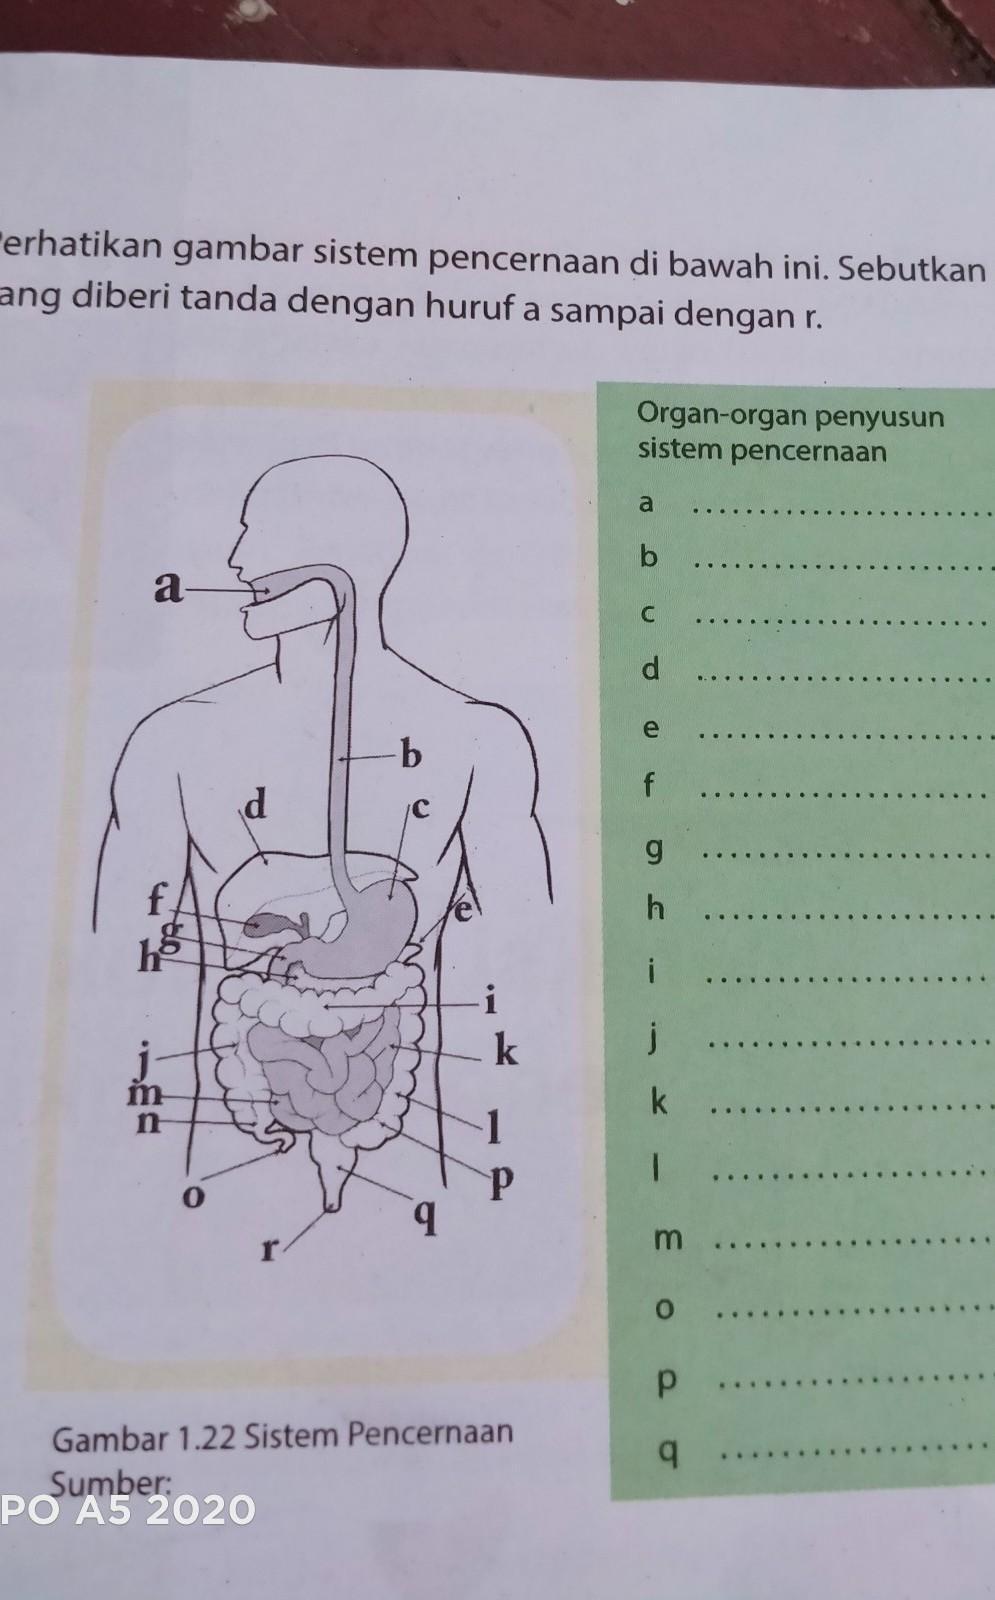 Sebutkan Organ-organ : sebutkan, organ-organ, Sebutkan, Organ, Penyusun, Sistem, Pencernaan, Brainly.co.id